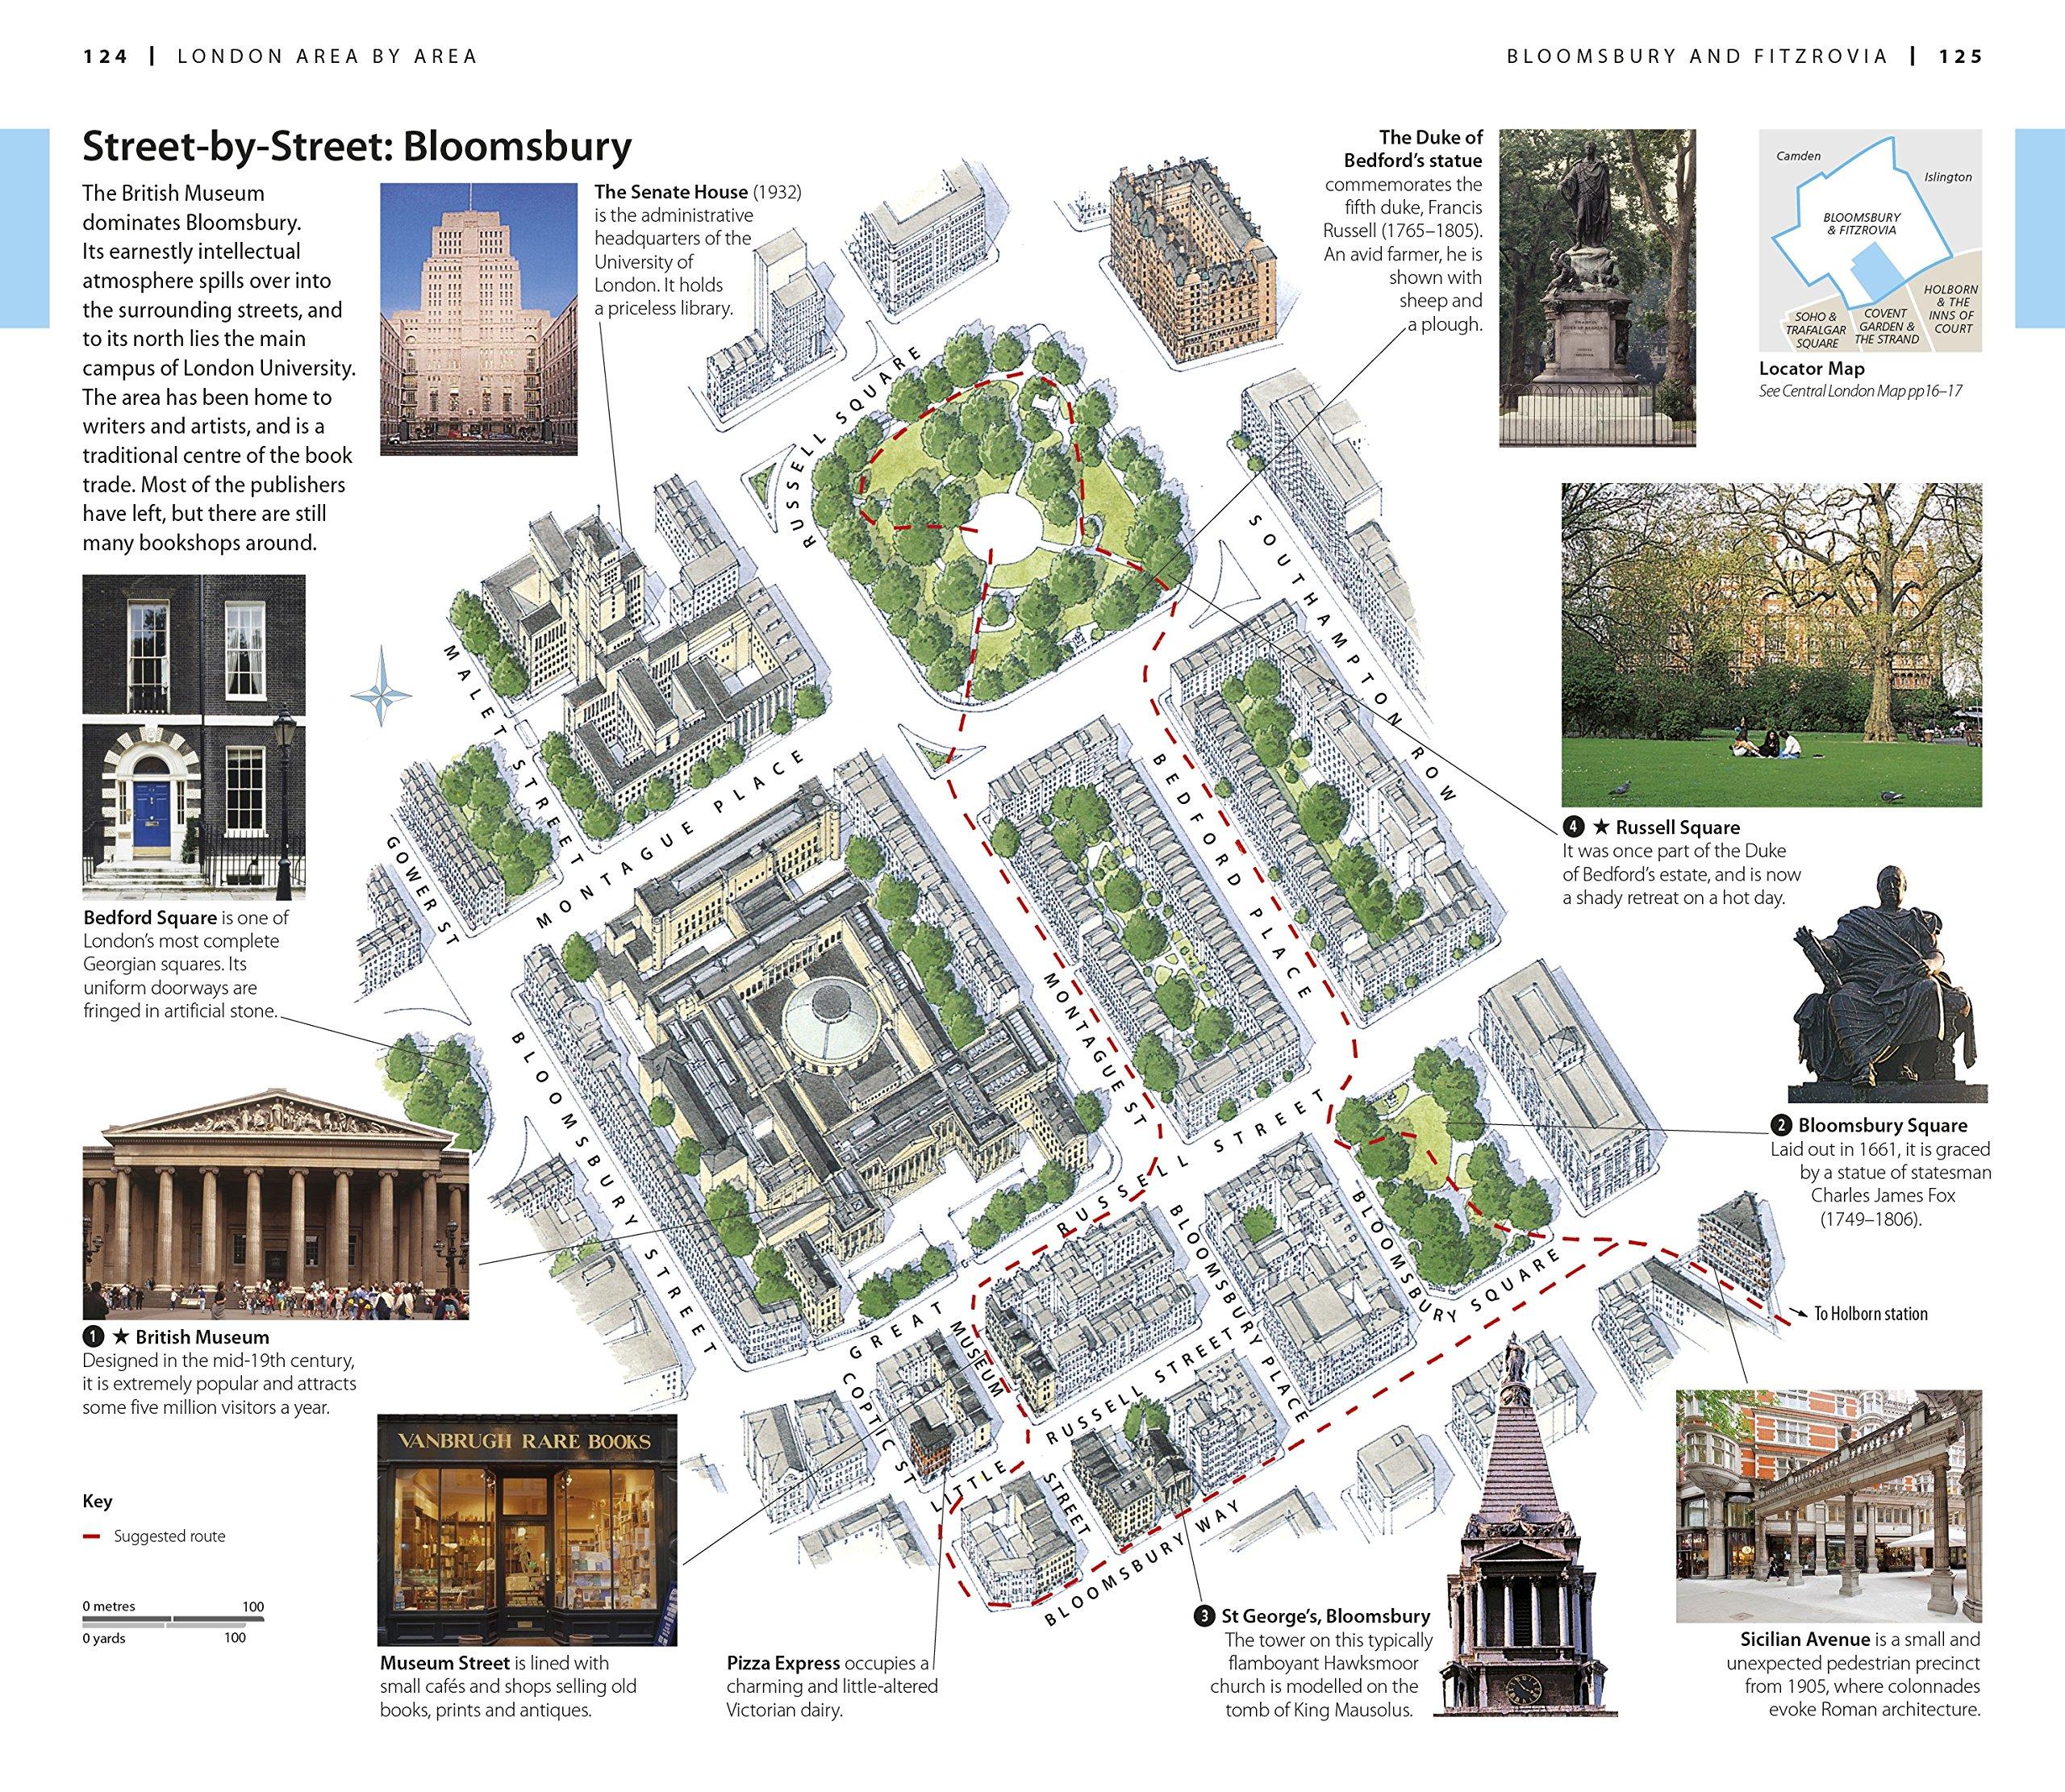 dk eyewitness travel guide london dk publishing 9781465400482 rh amazon ca dk eyewitness travel guide london pdf eyewitness travel guide london pdf